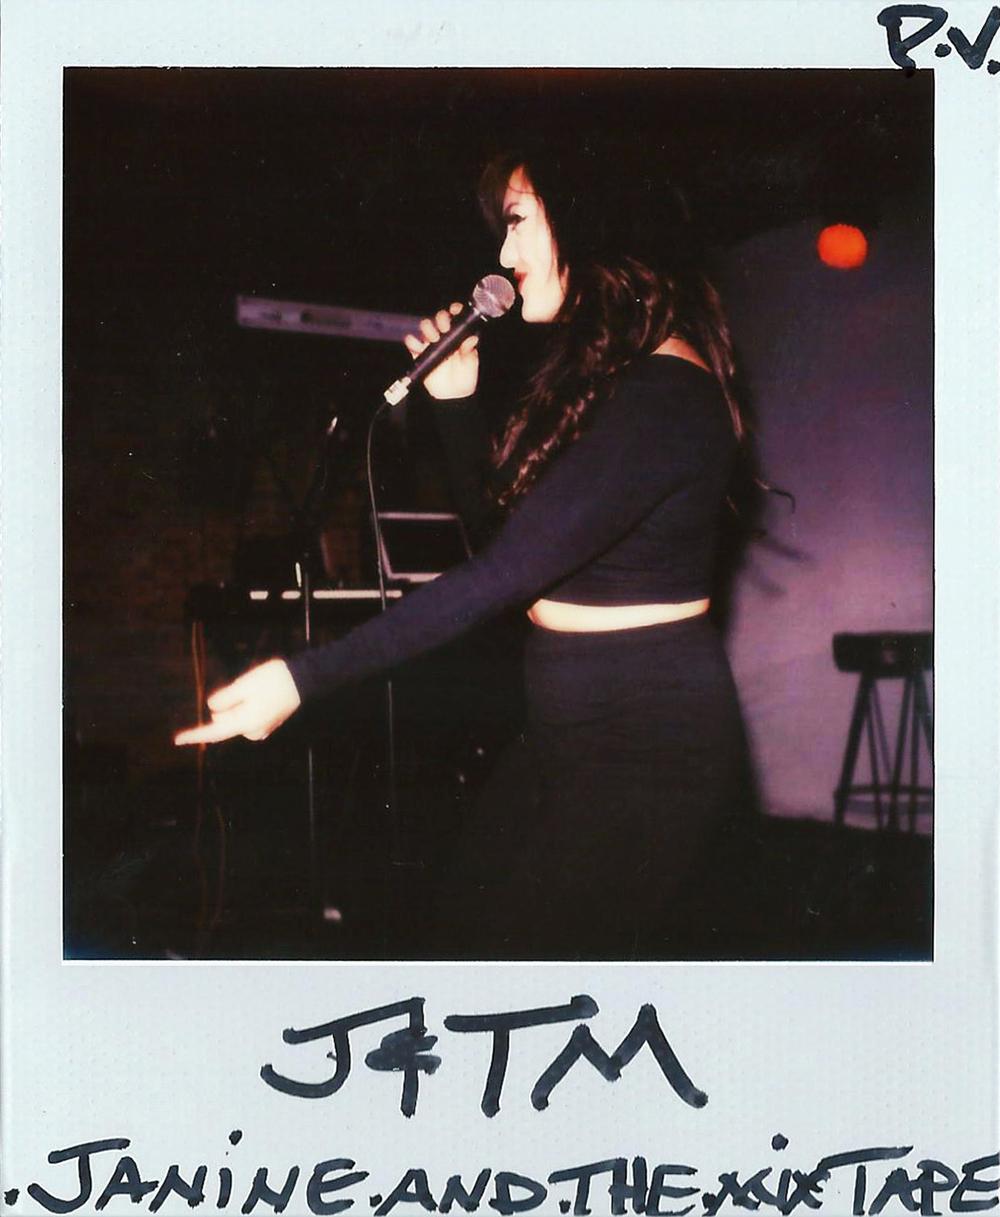 janine mix3.jpg